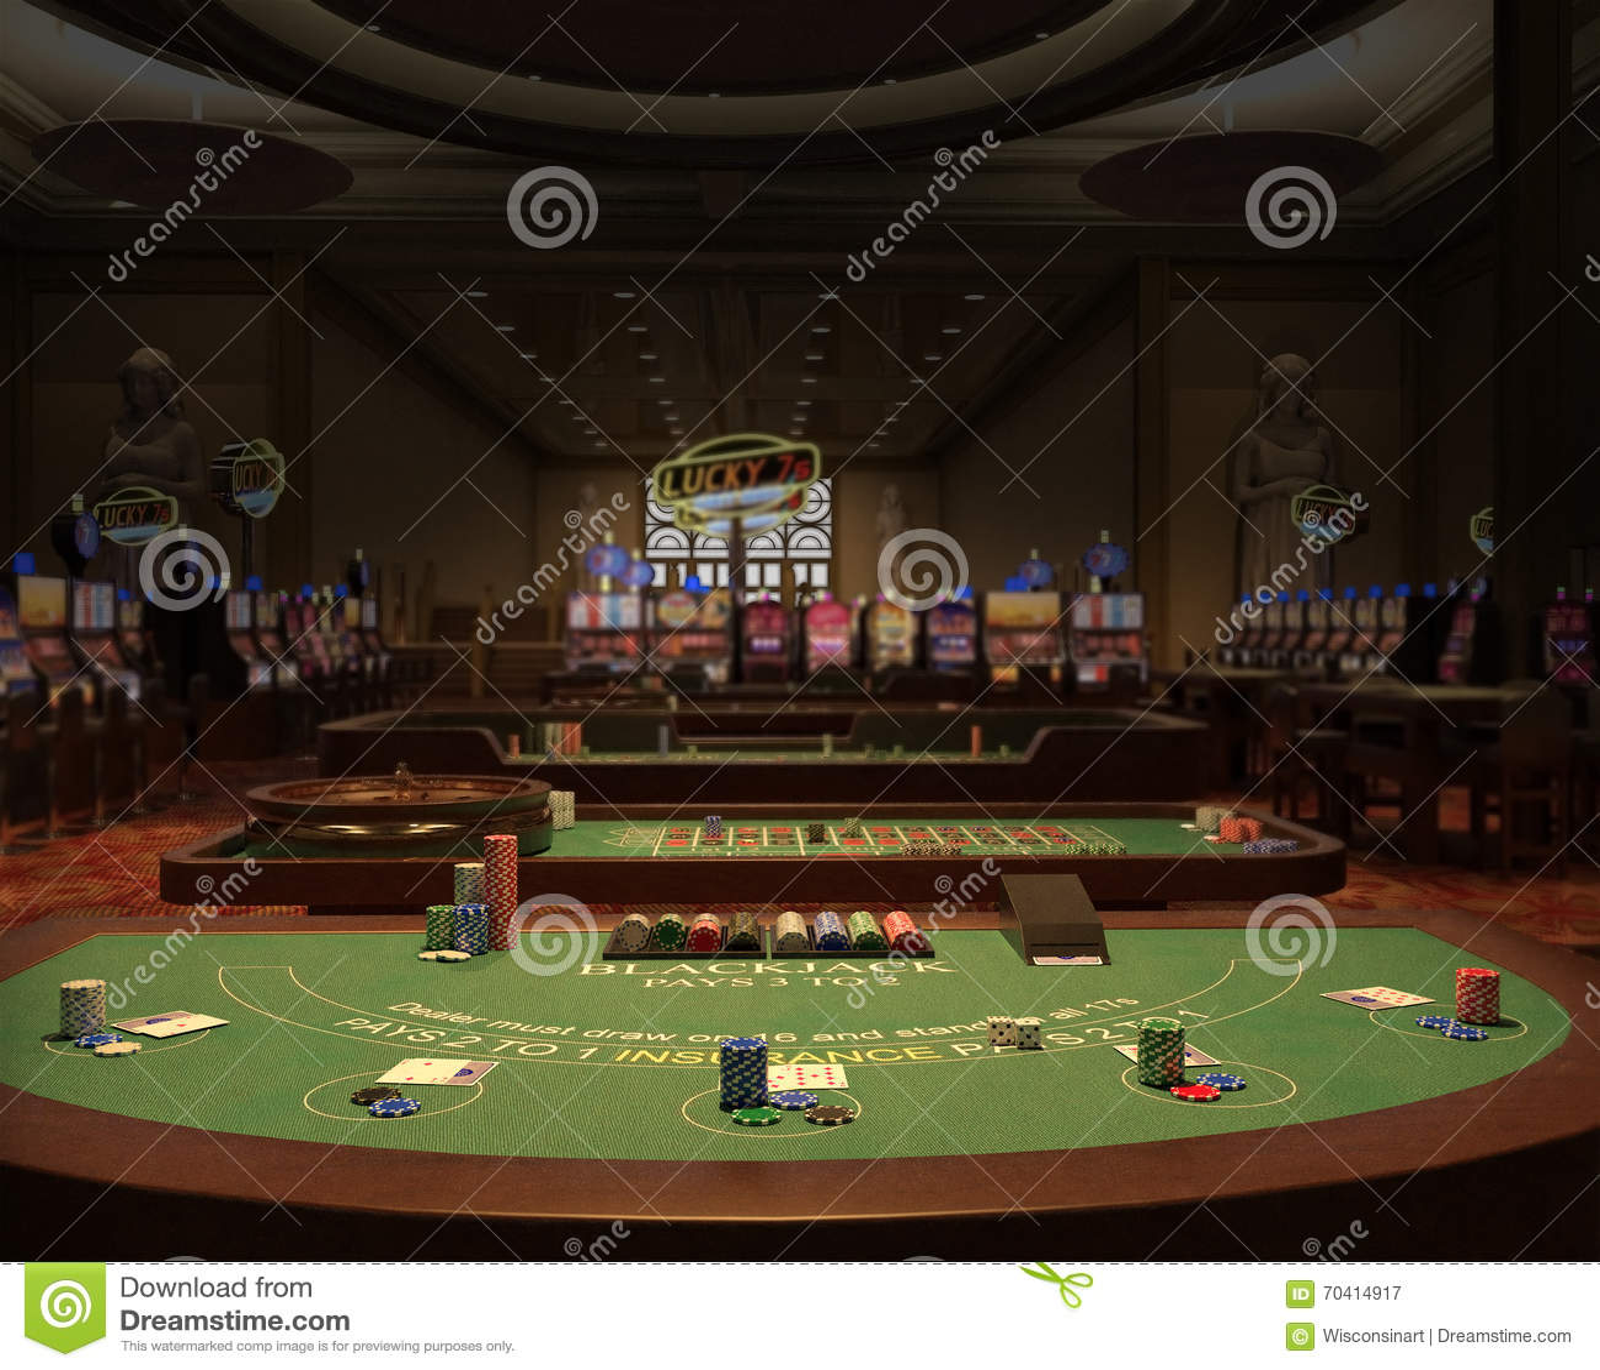 Kasyno, Uprawia hazard Hall, Blackjack ilustracja